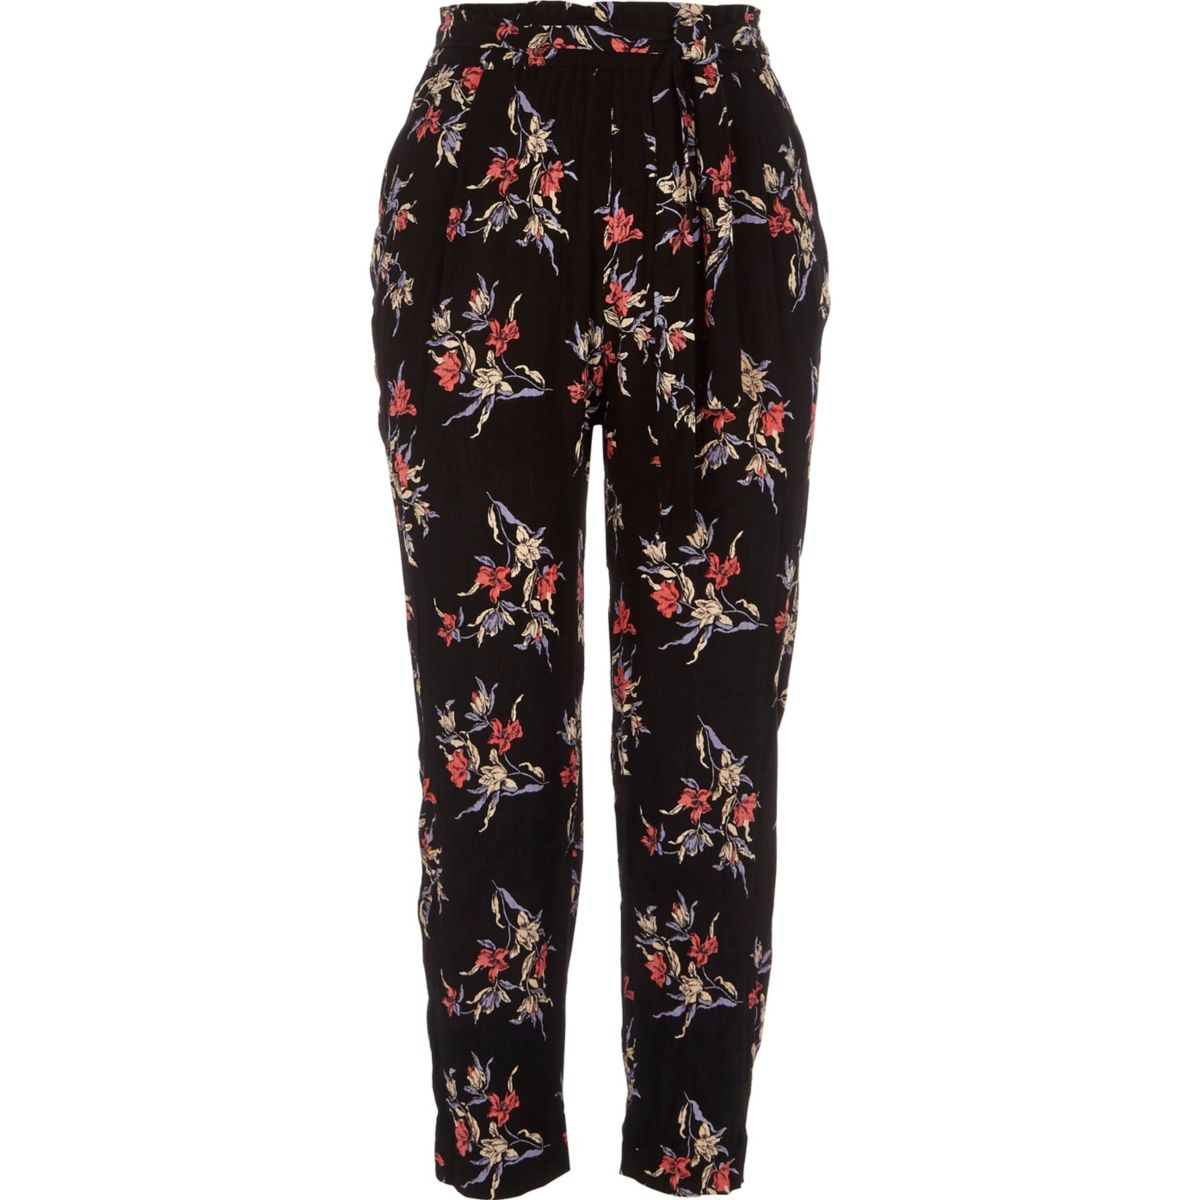 Black floral print tapered pants